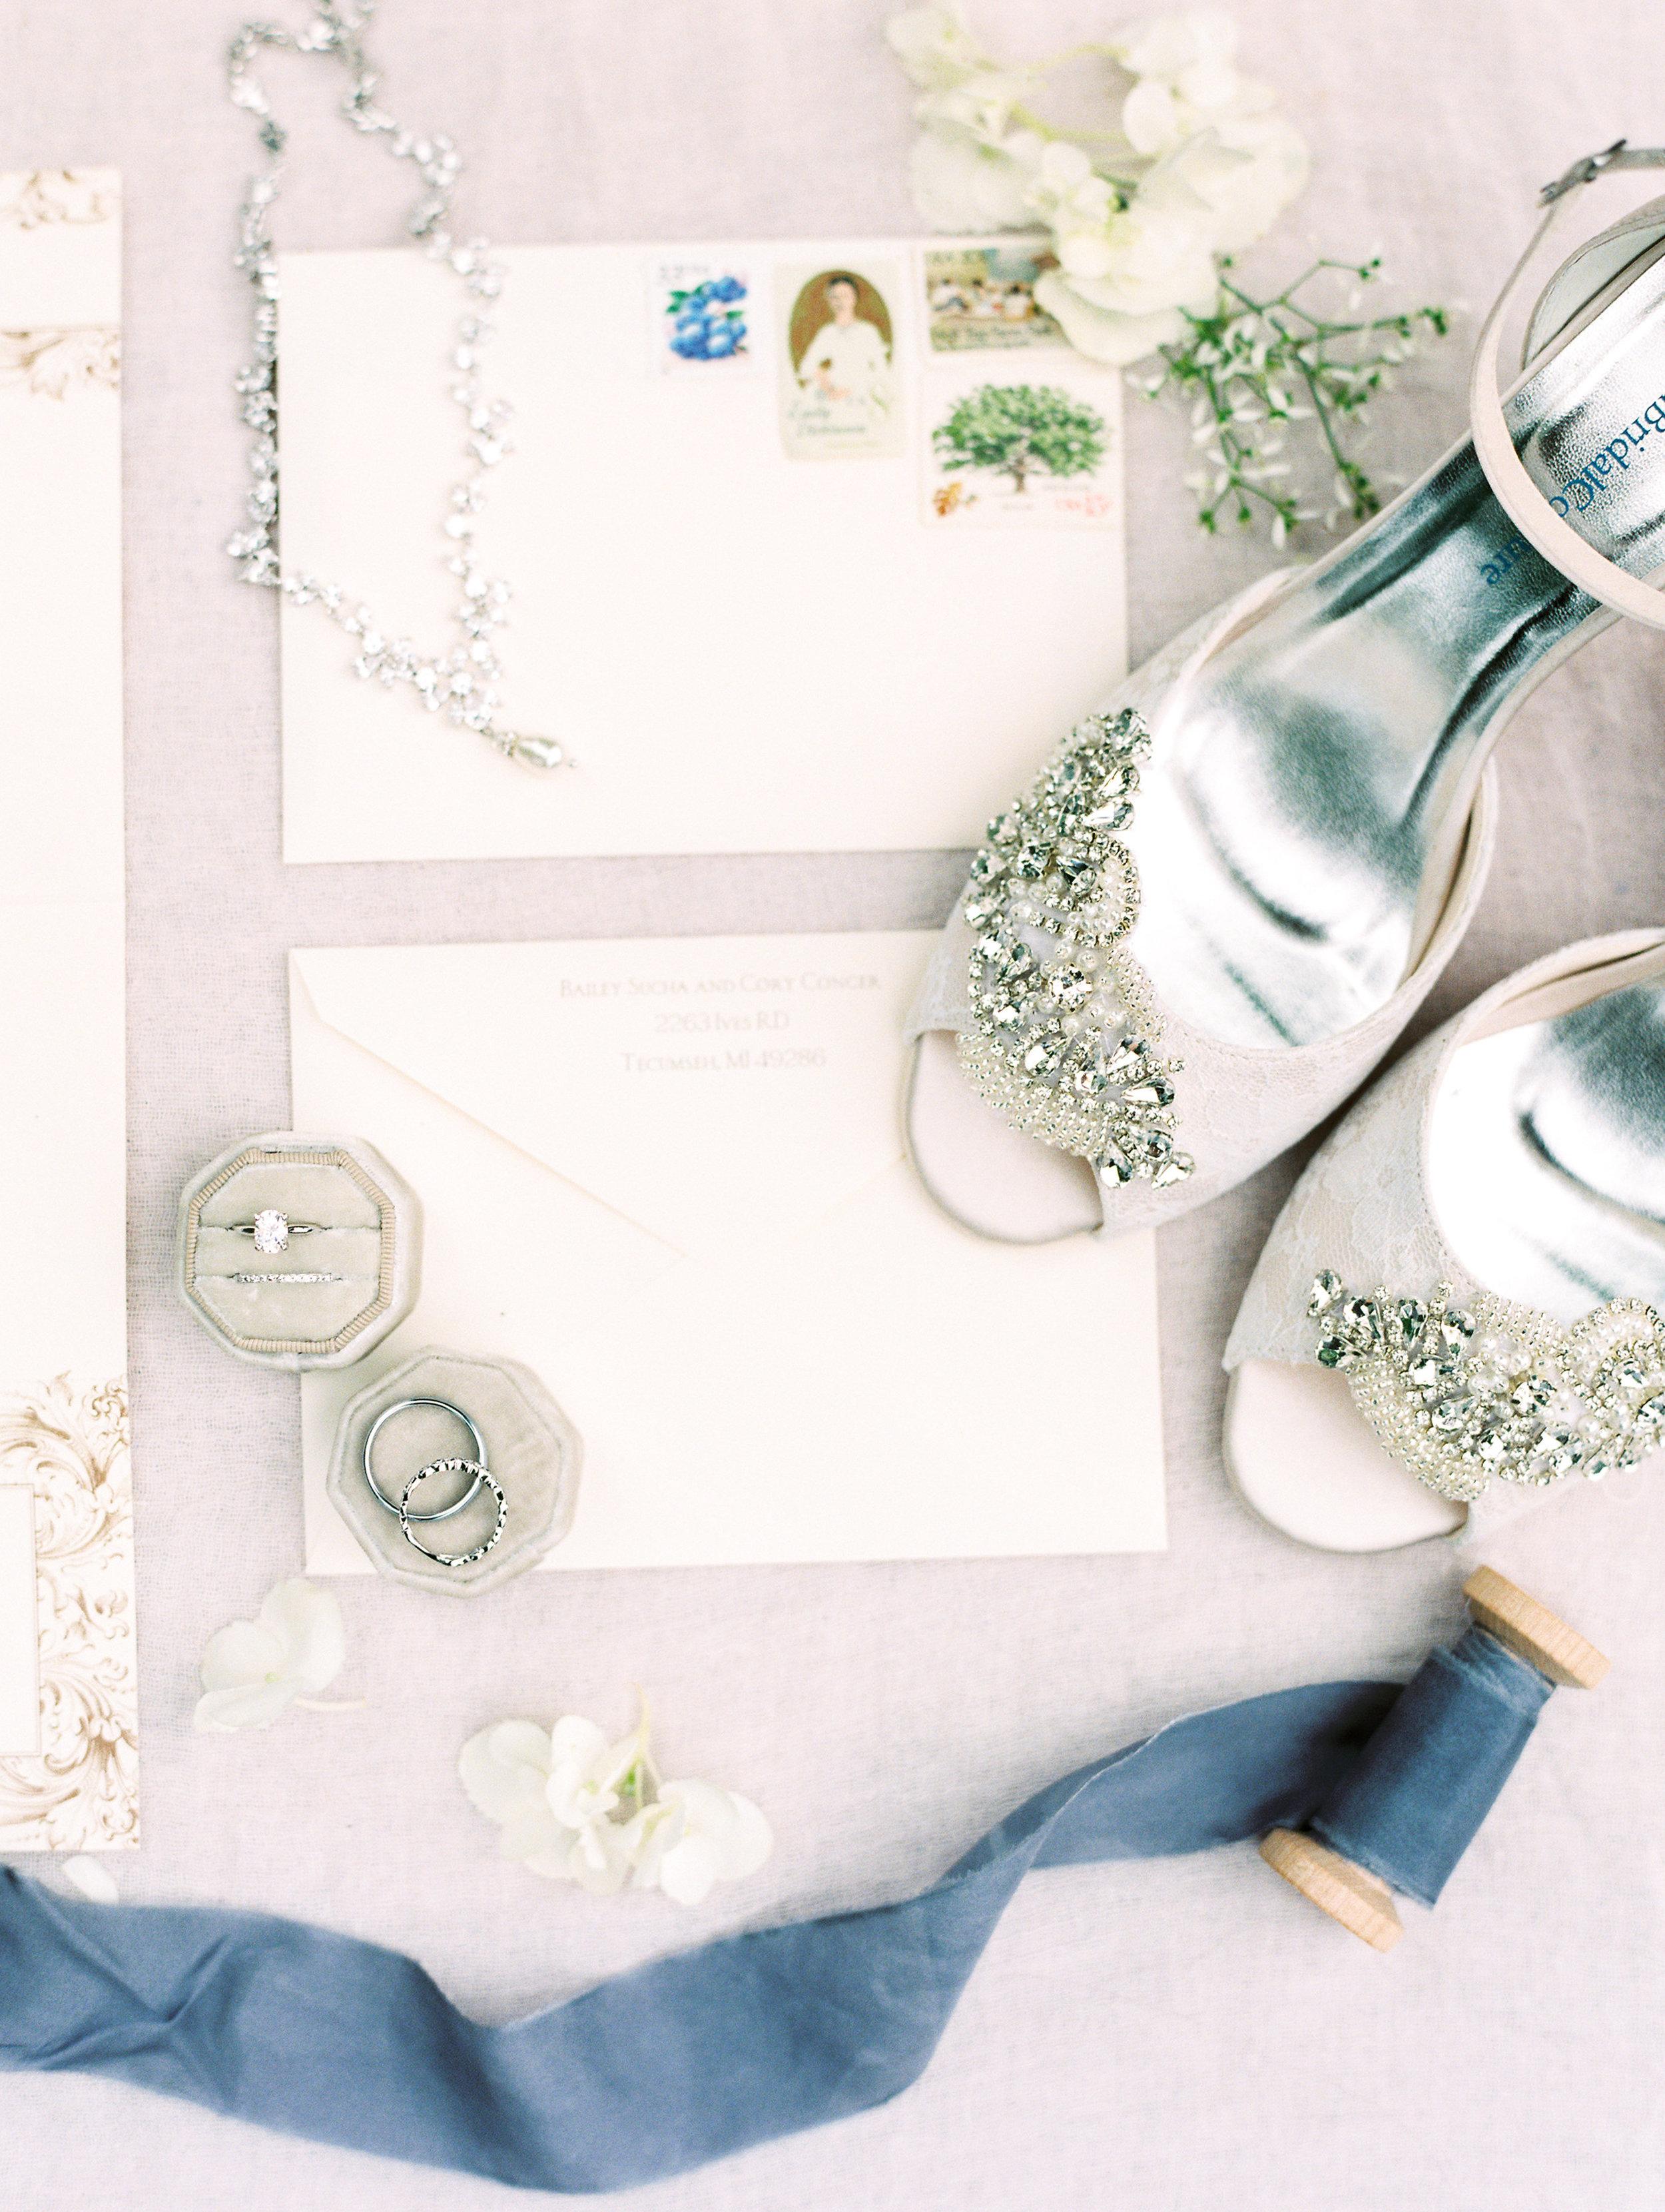 Conger+Wedding+Details-4.jpg